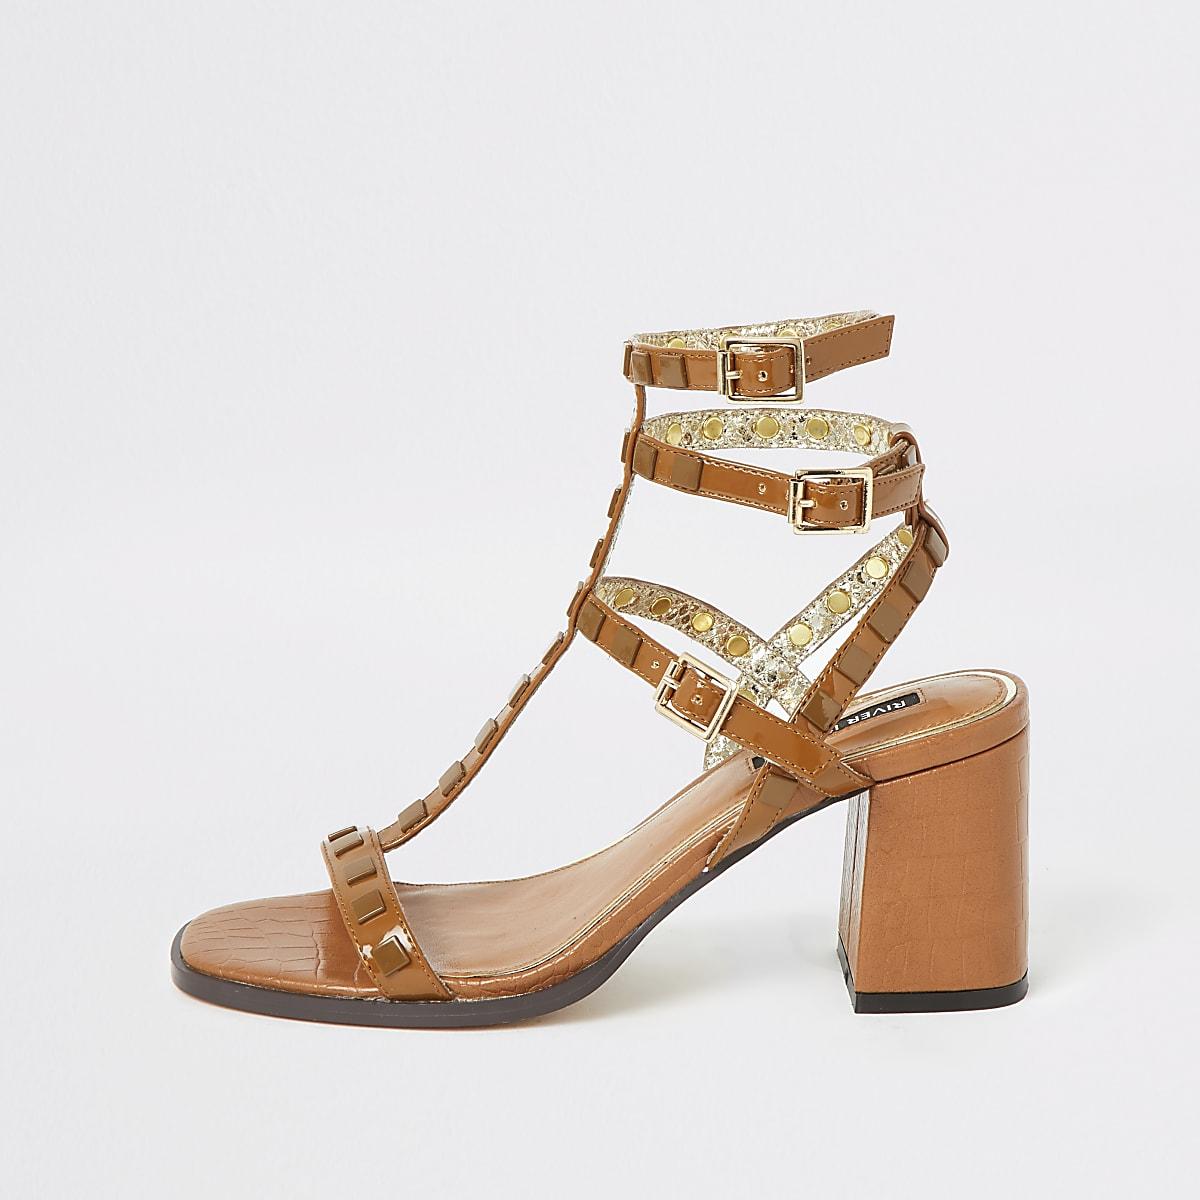 Bruine sandalen met studs en blokhak